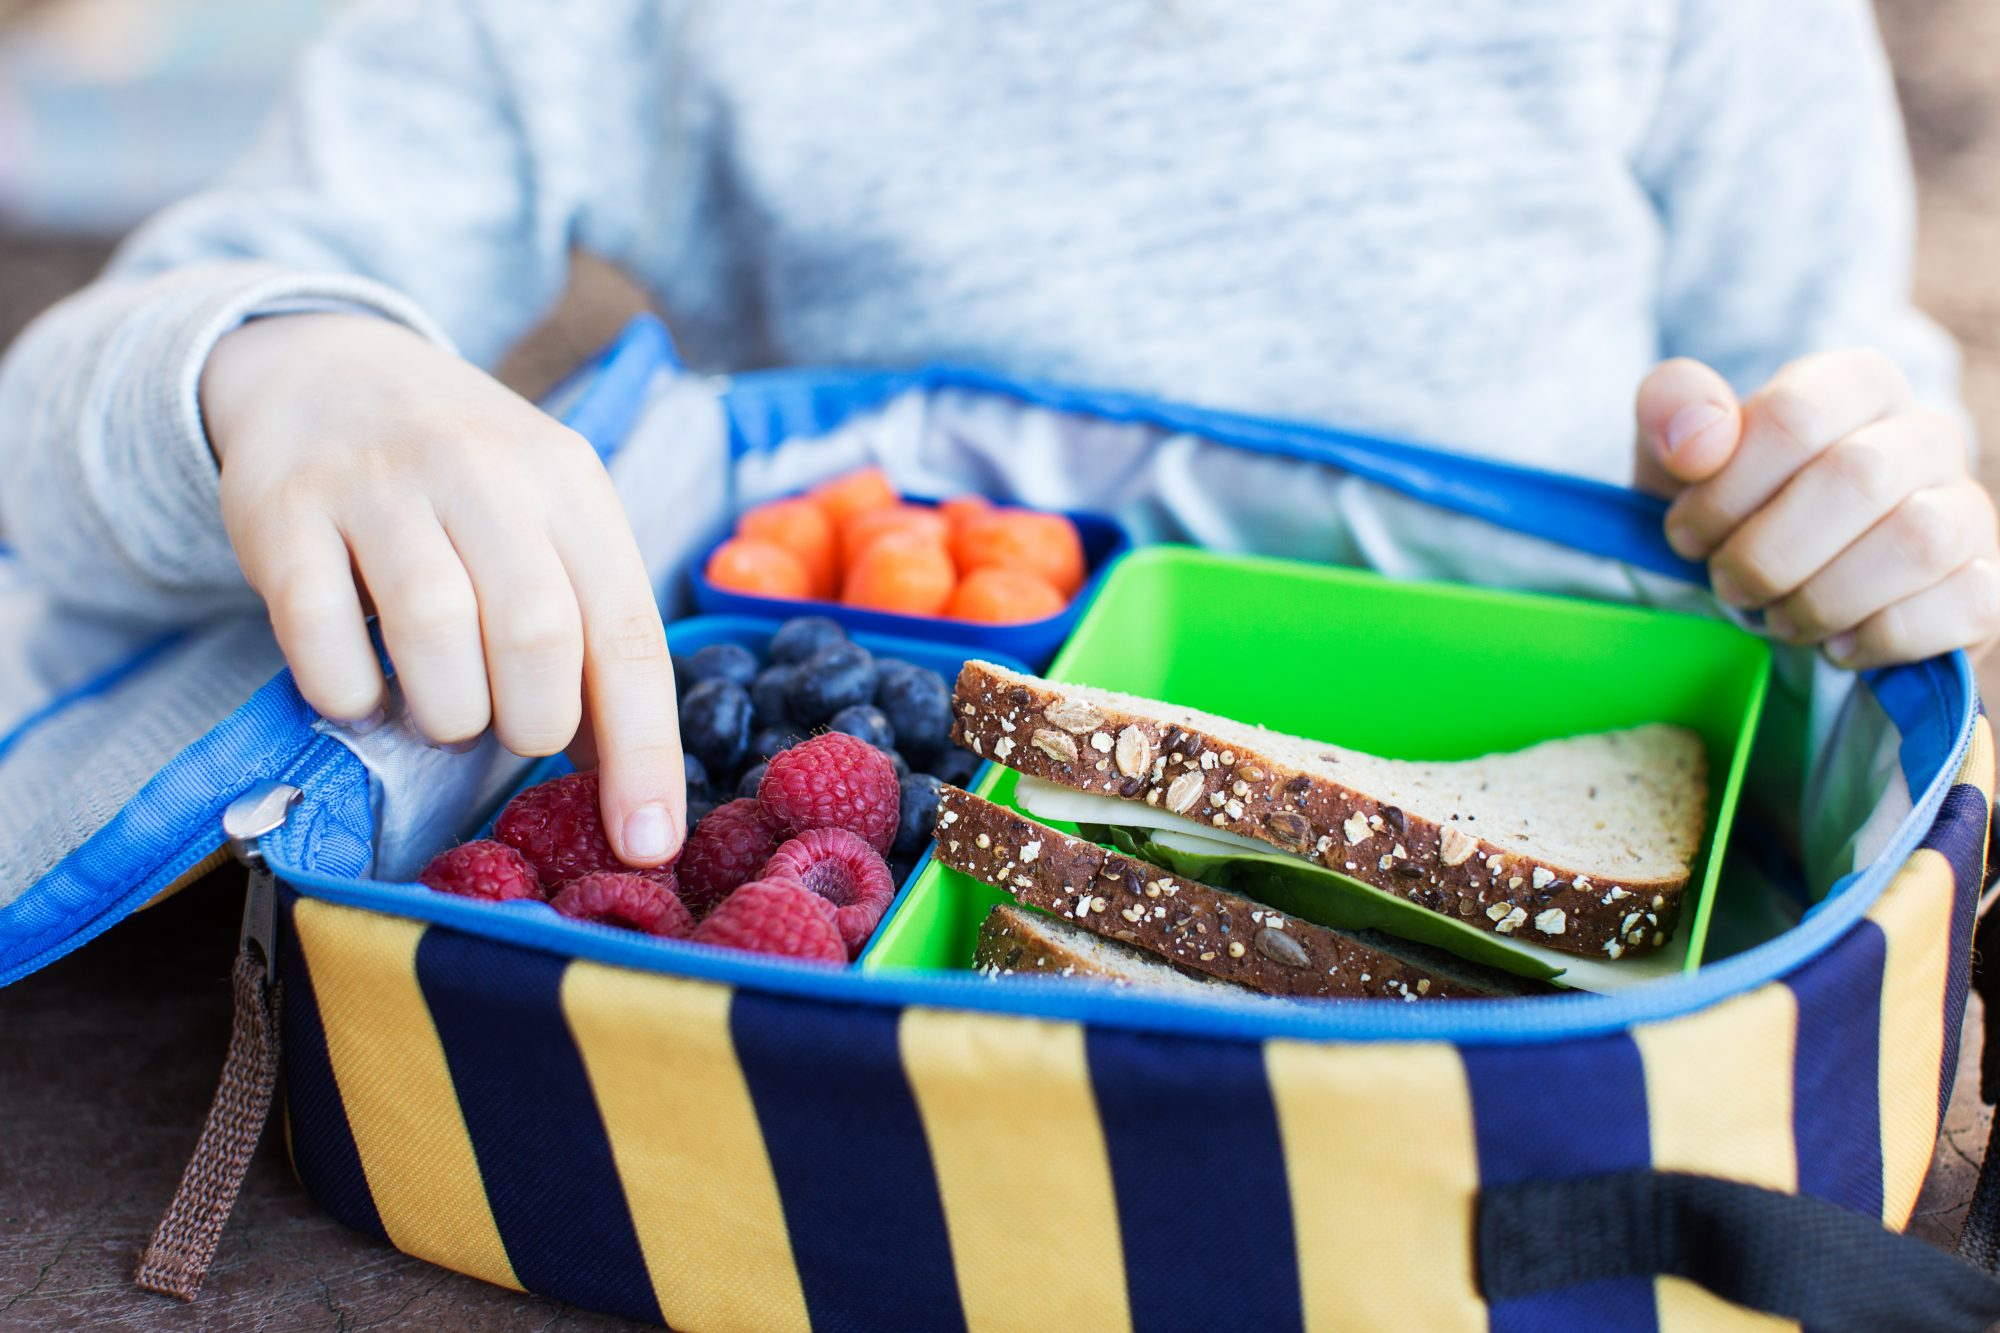 getty-school-lunch-image